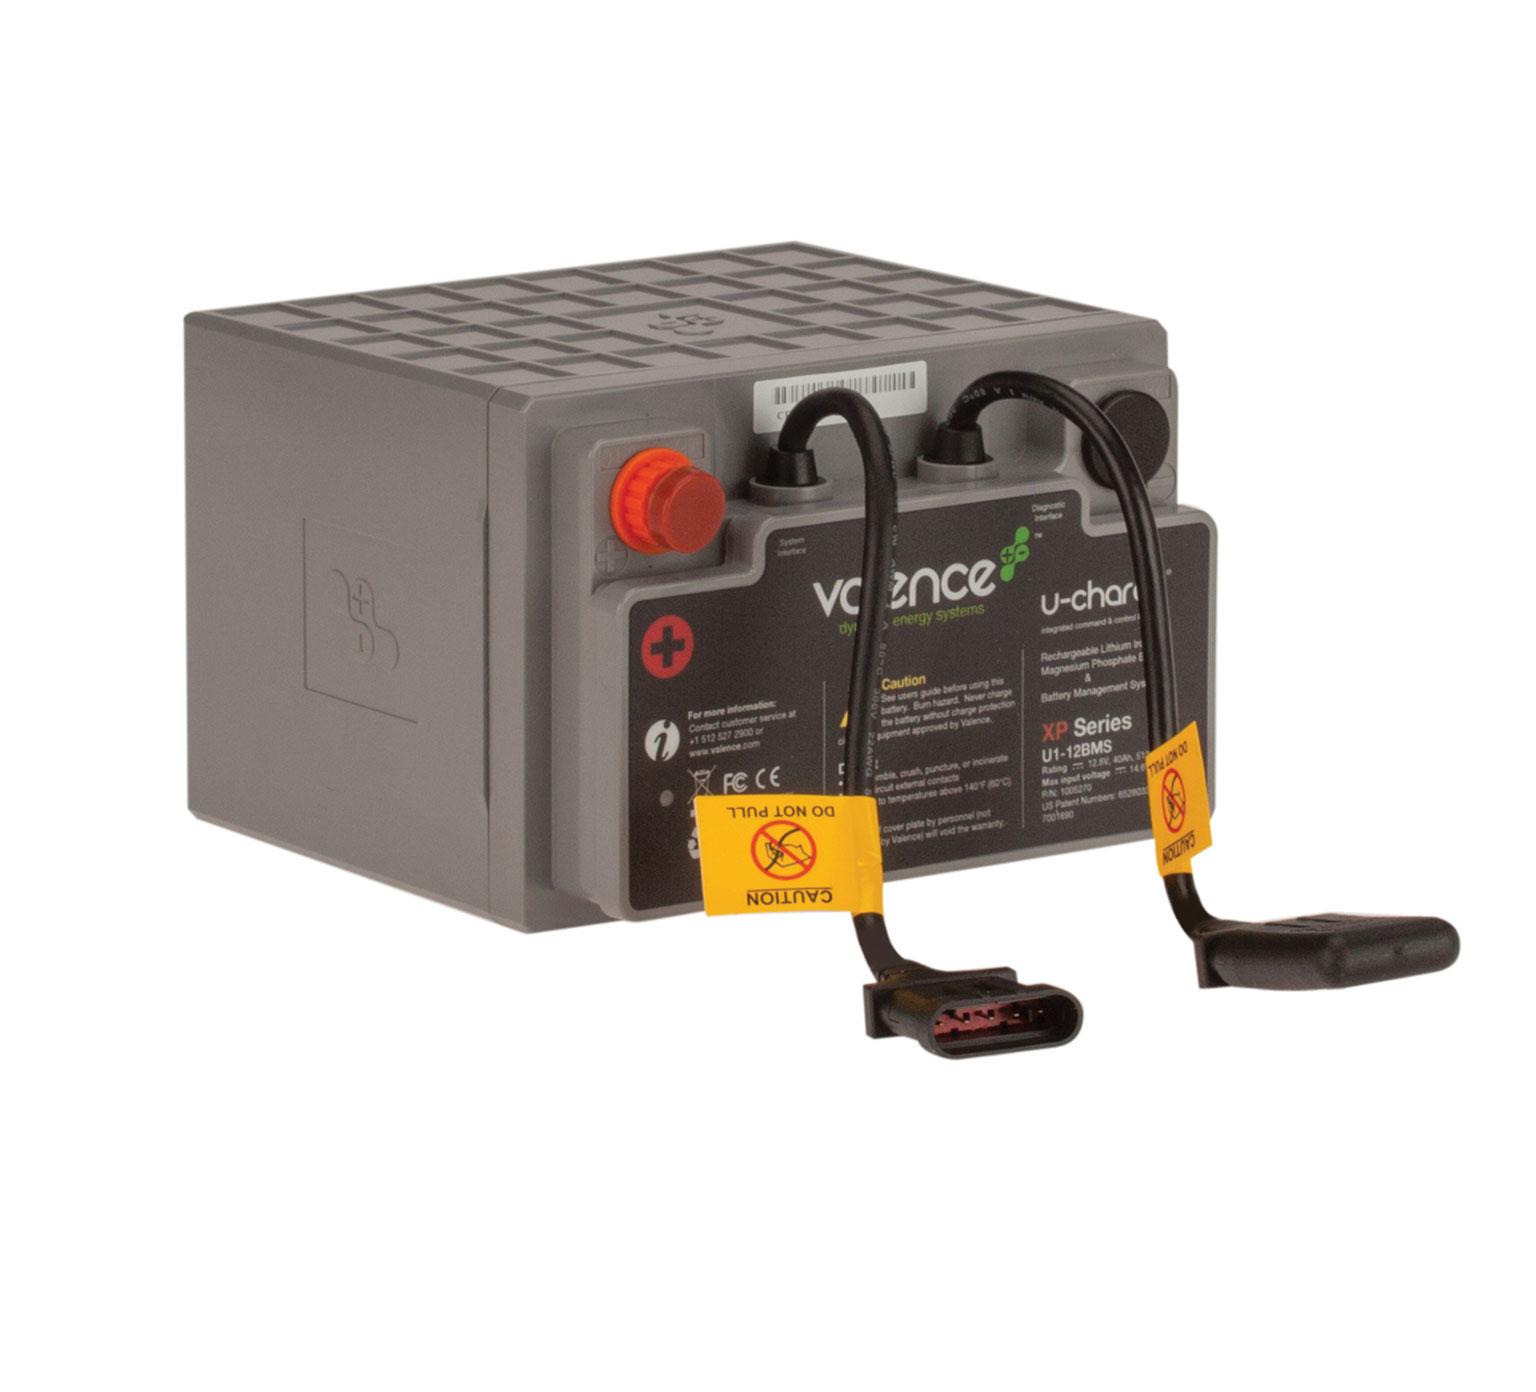 Tennanttrue 12 Volt Li Ion Valence Battery Kit Pn 9008690